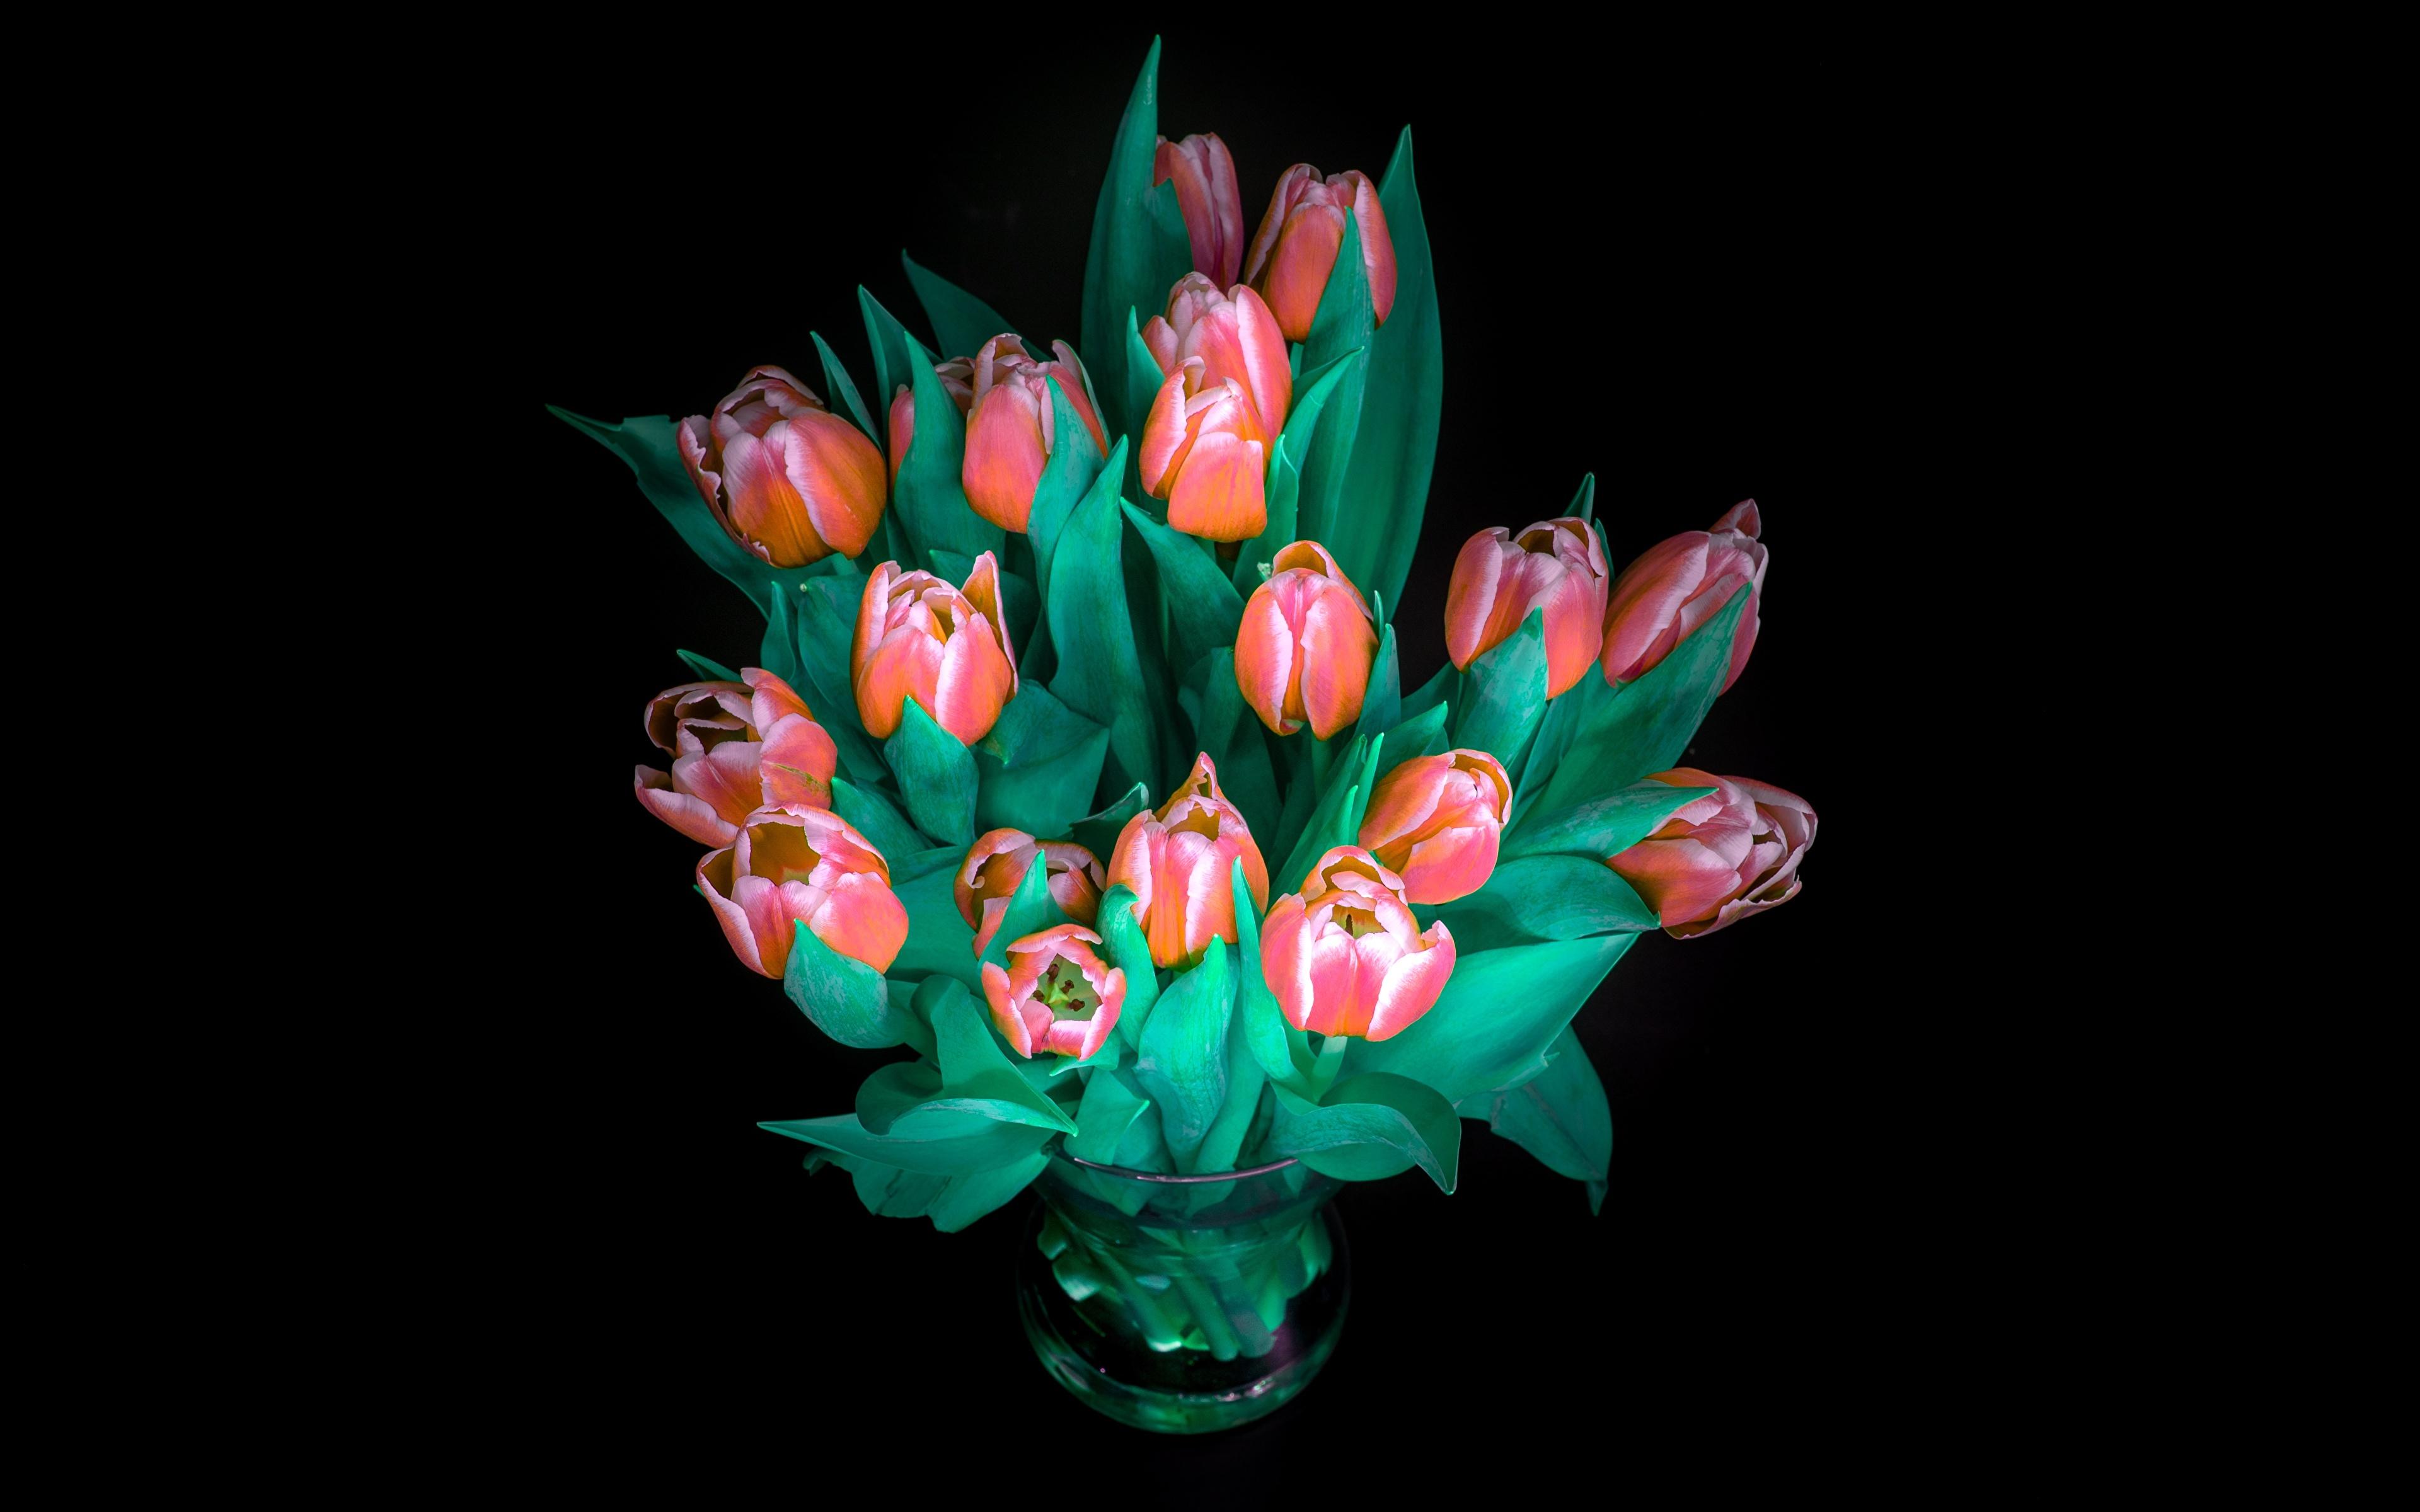 Pictures bouquet Tulips Flowers Black background 3840x2400 Bouquets tulip flower